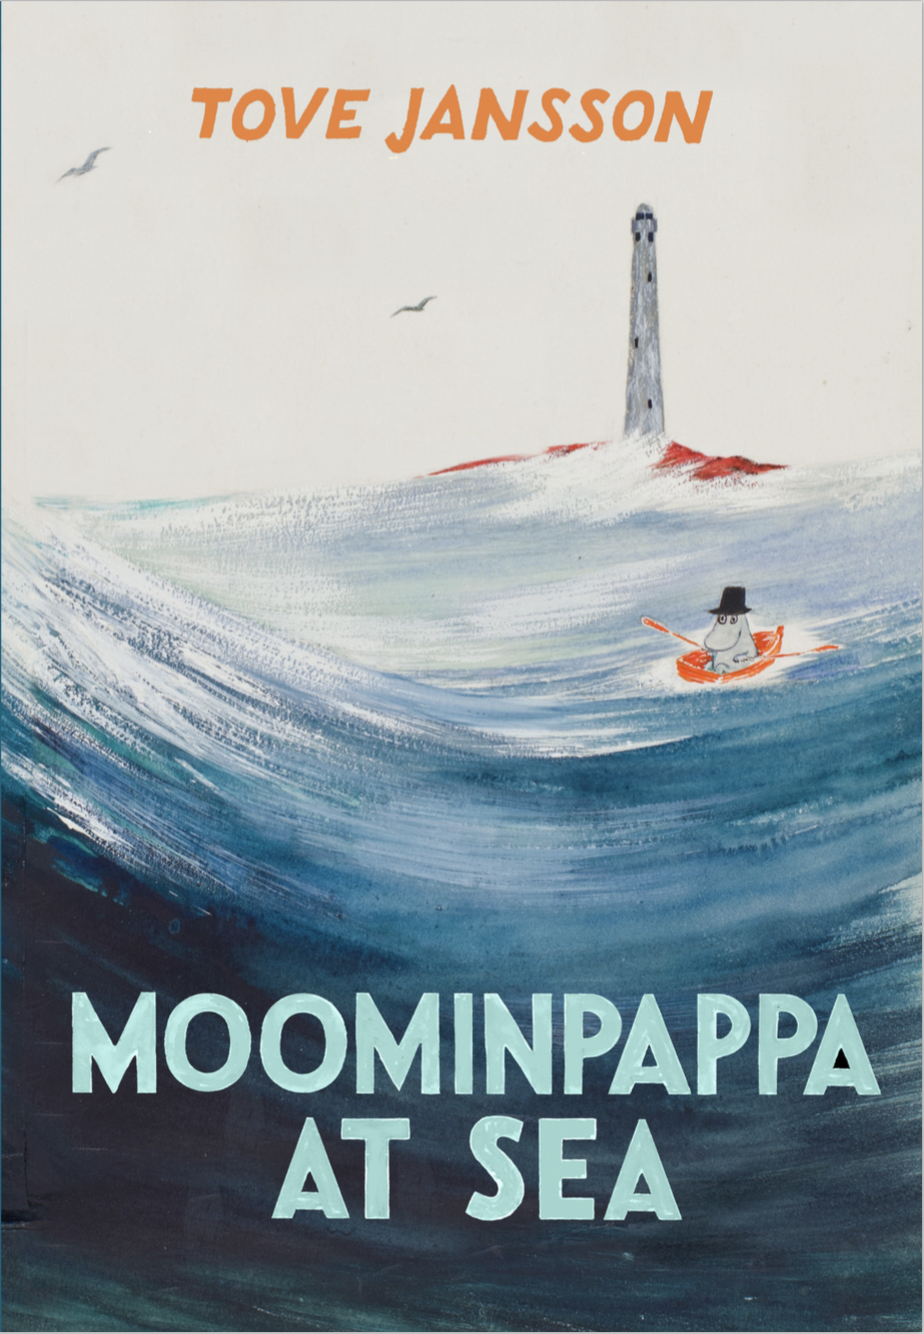 Tove Jansson Moominpapa At Sea Sort of Books.jpg